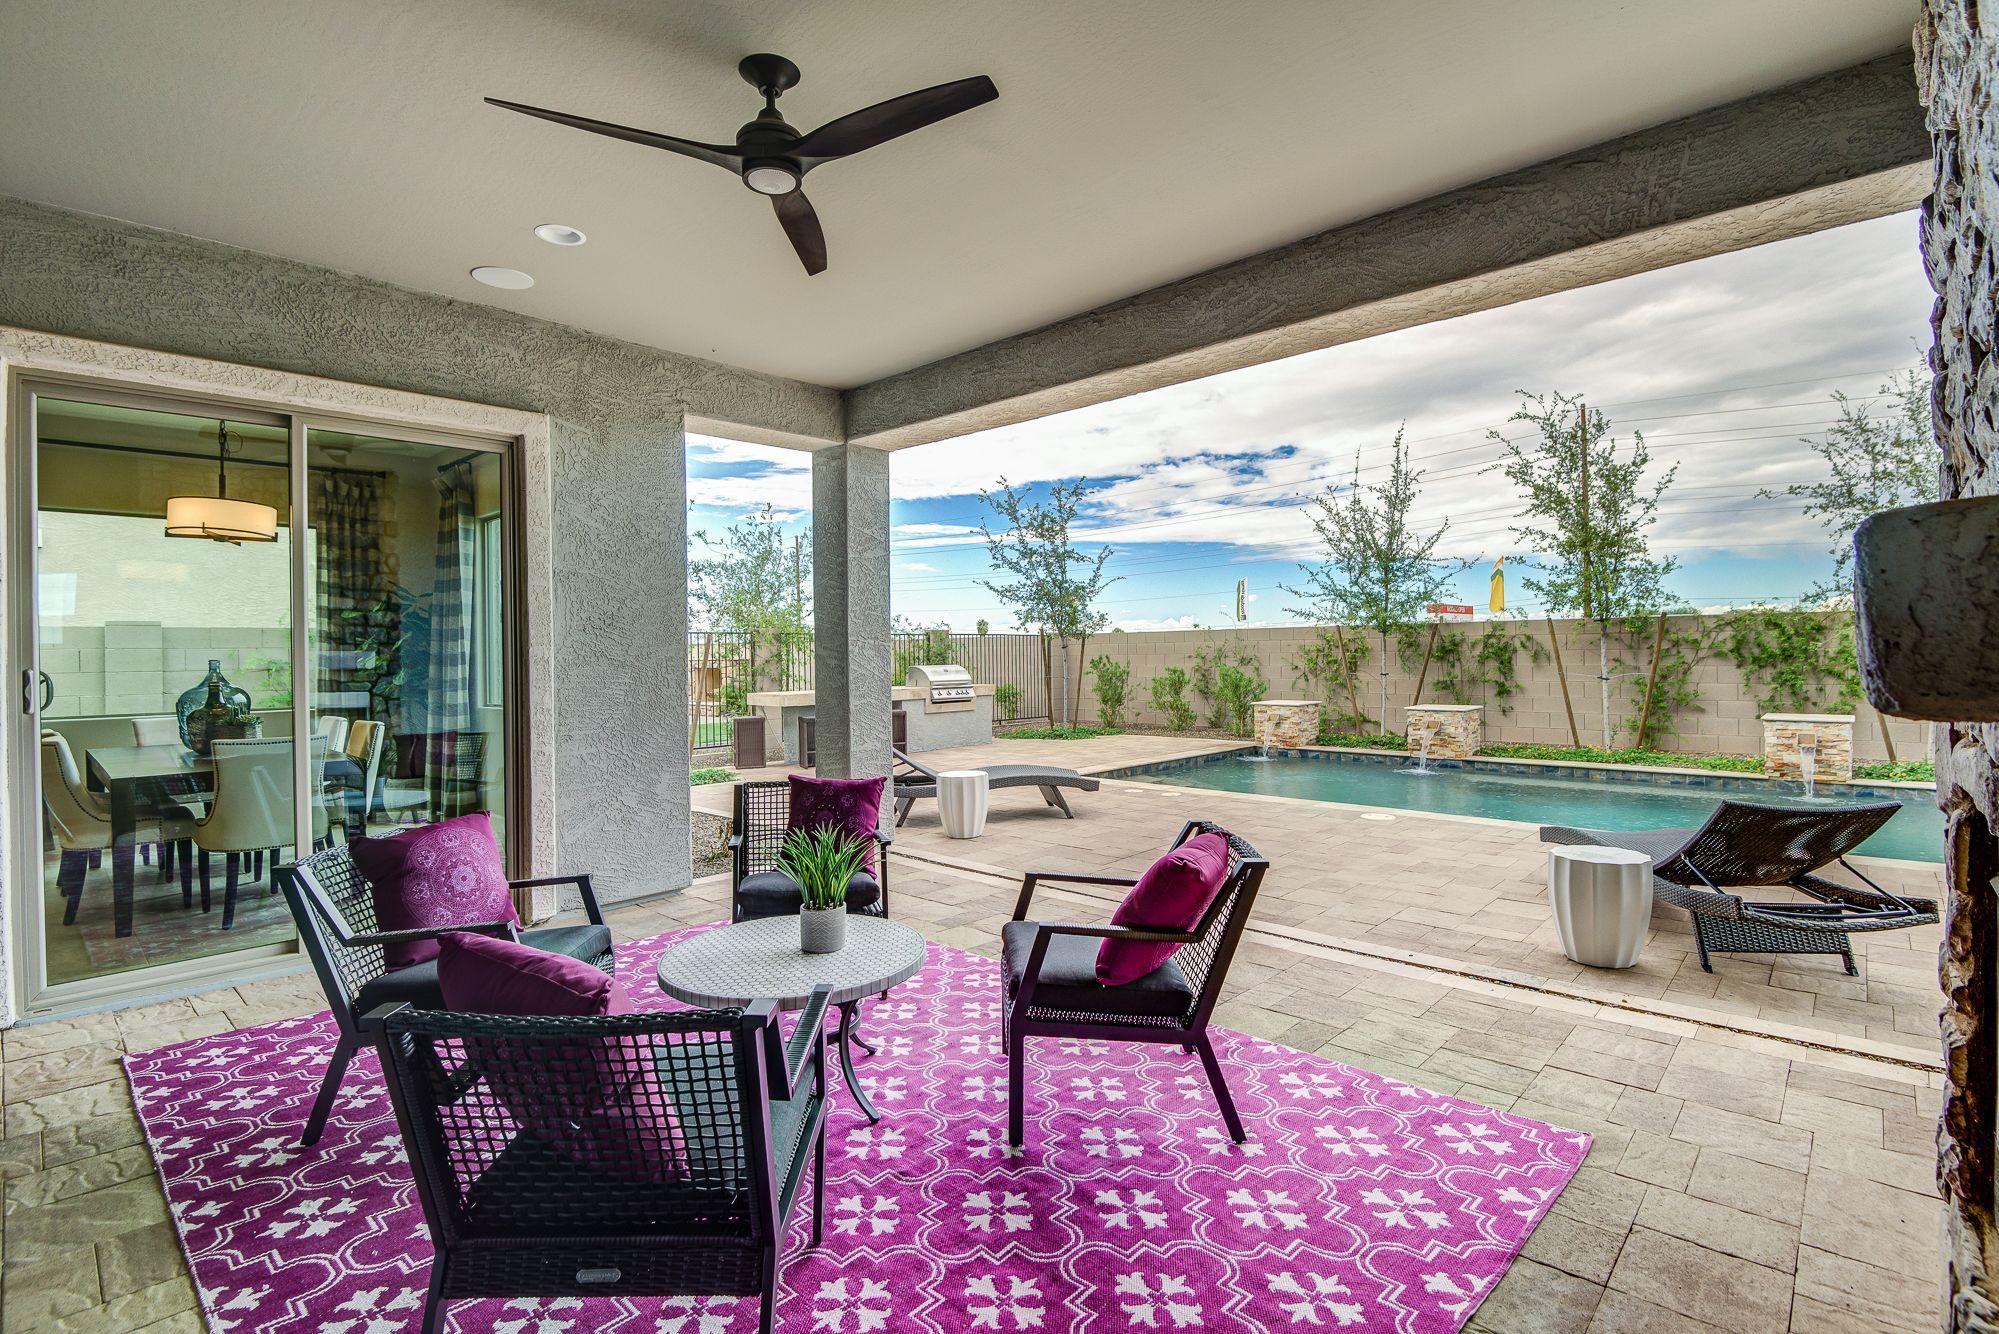 It Is Officially Summer Summertime Summerbegins Backyardgoals Outdoor Living Space Woodside Homes New Home Buyer